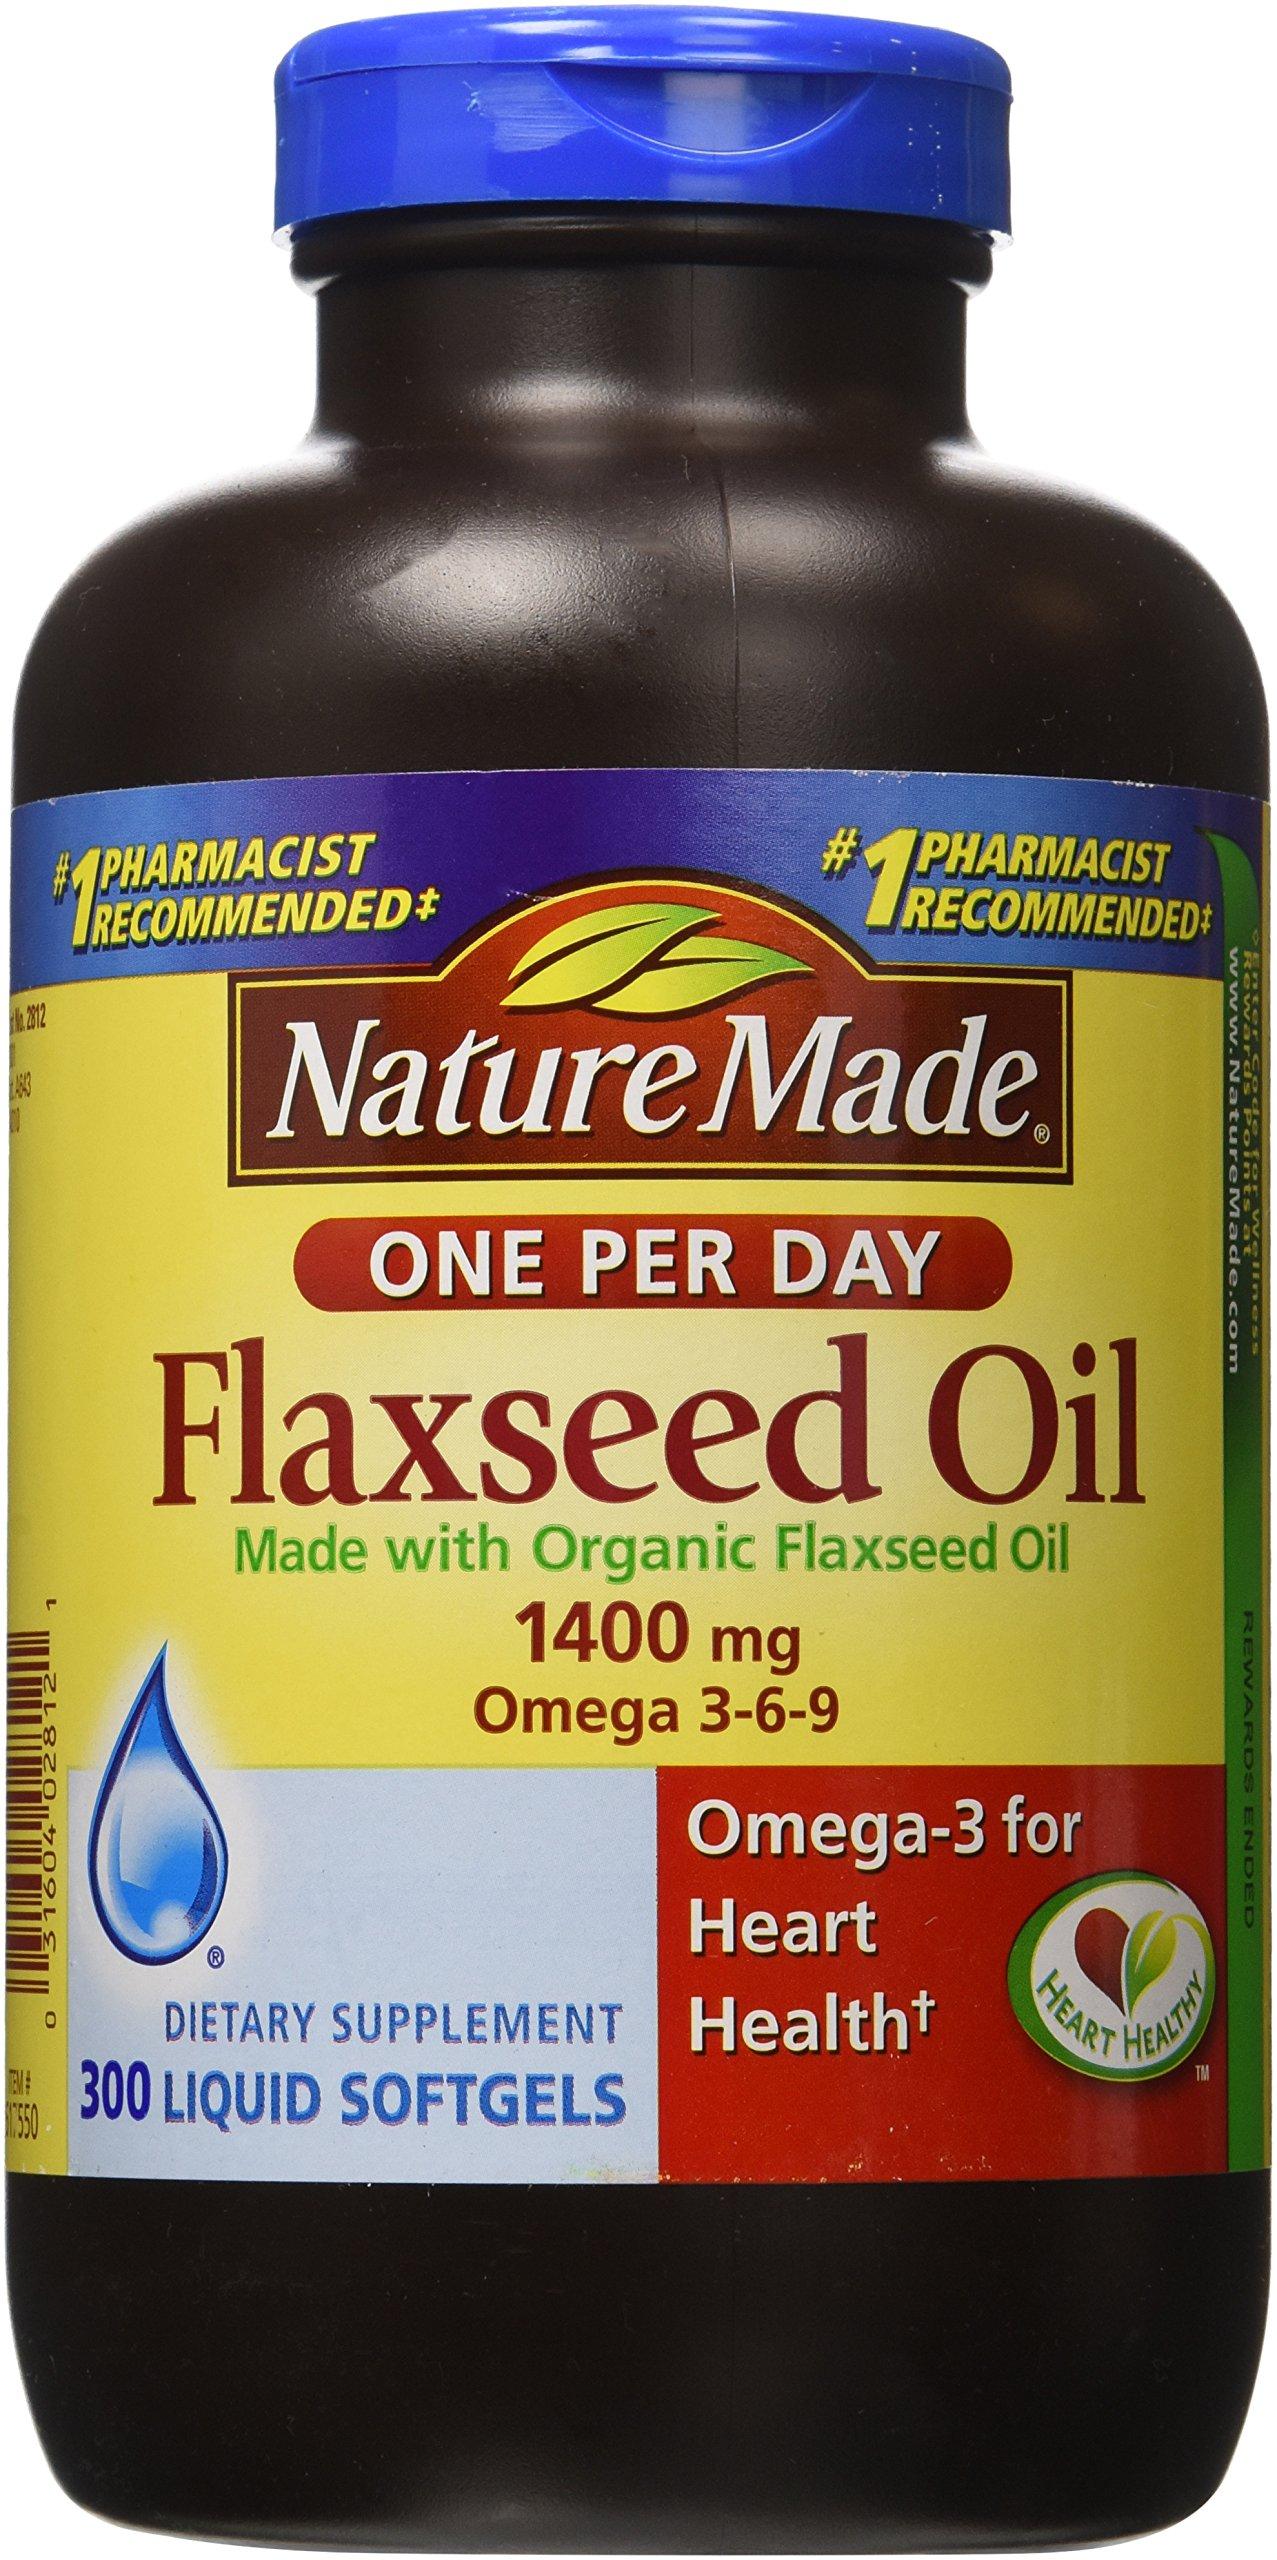 Buy Nature Made Organic Flaxseed Oil 1,400 mg - Omega-3-6-9